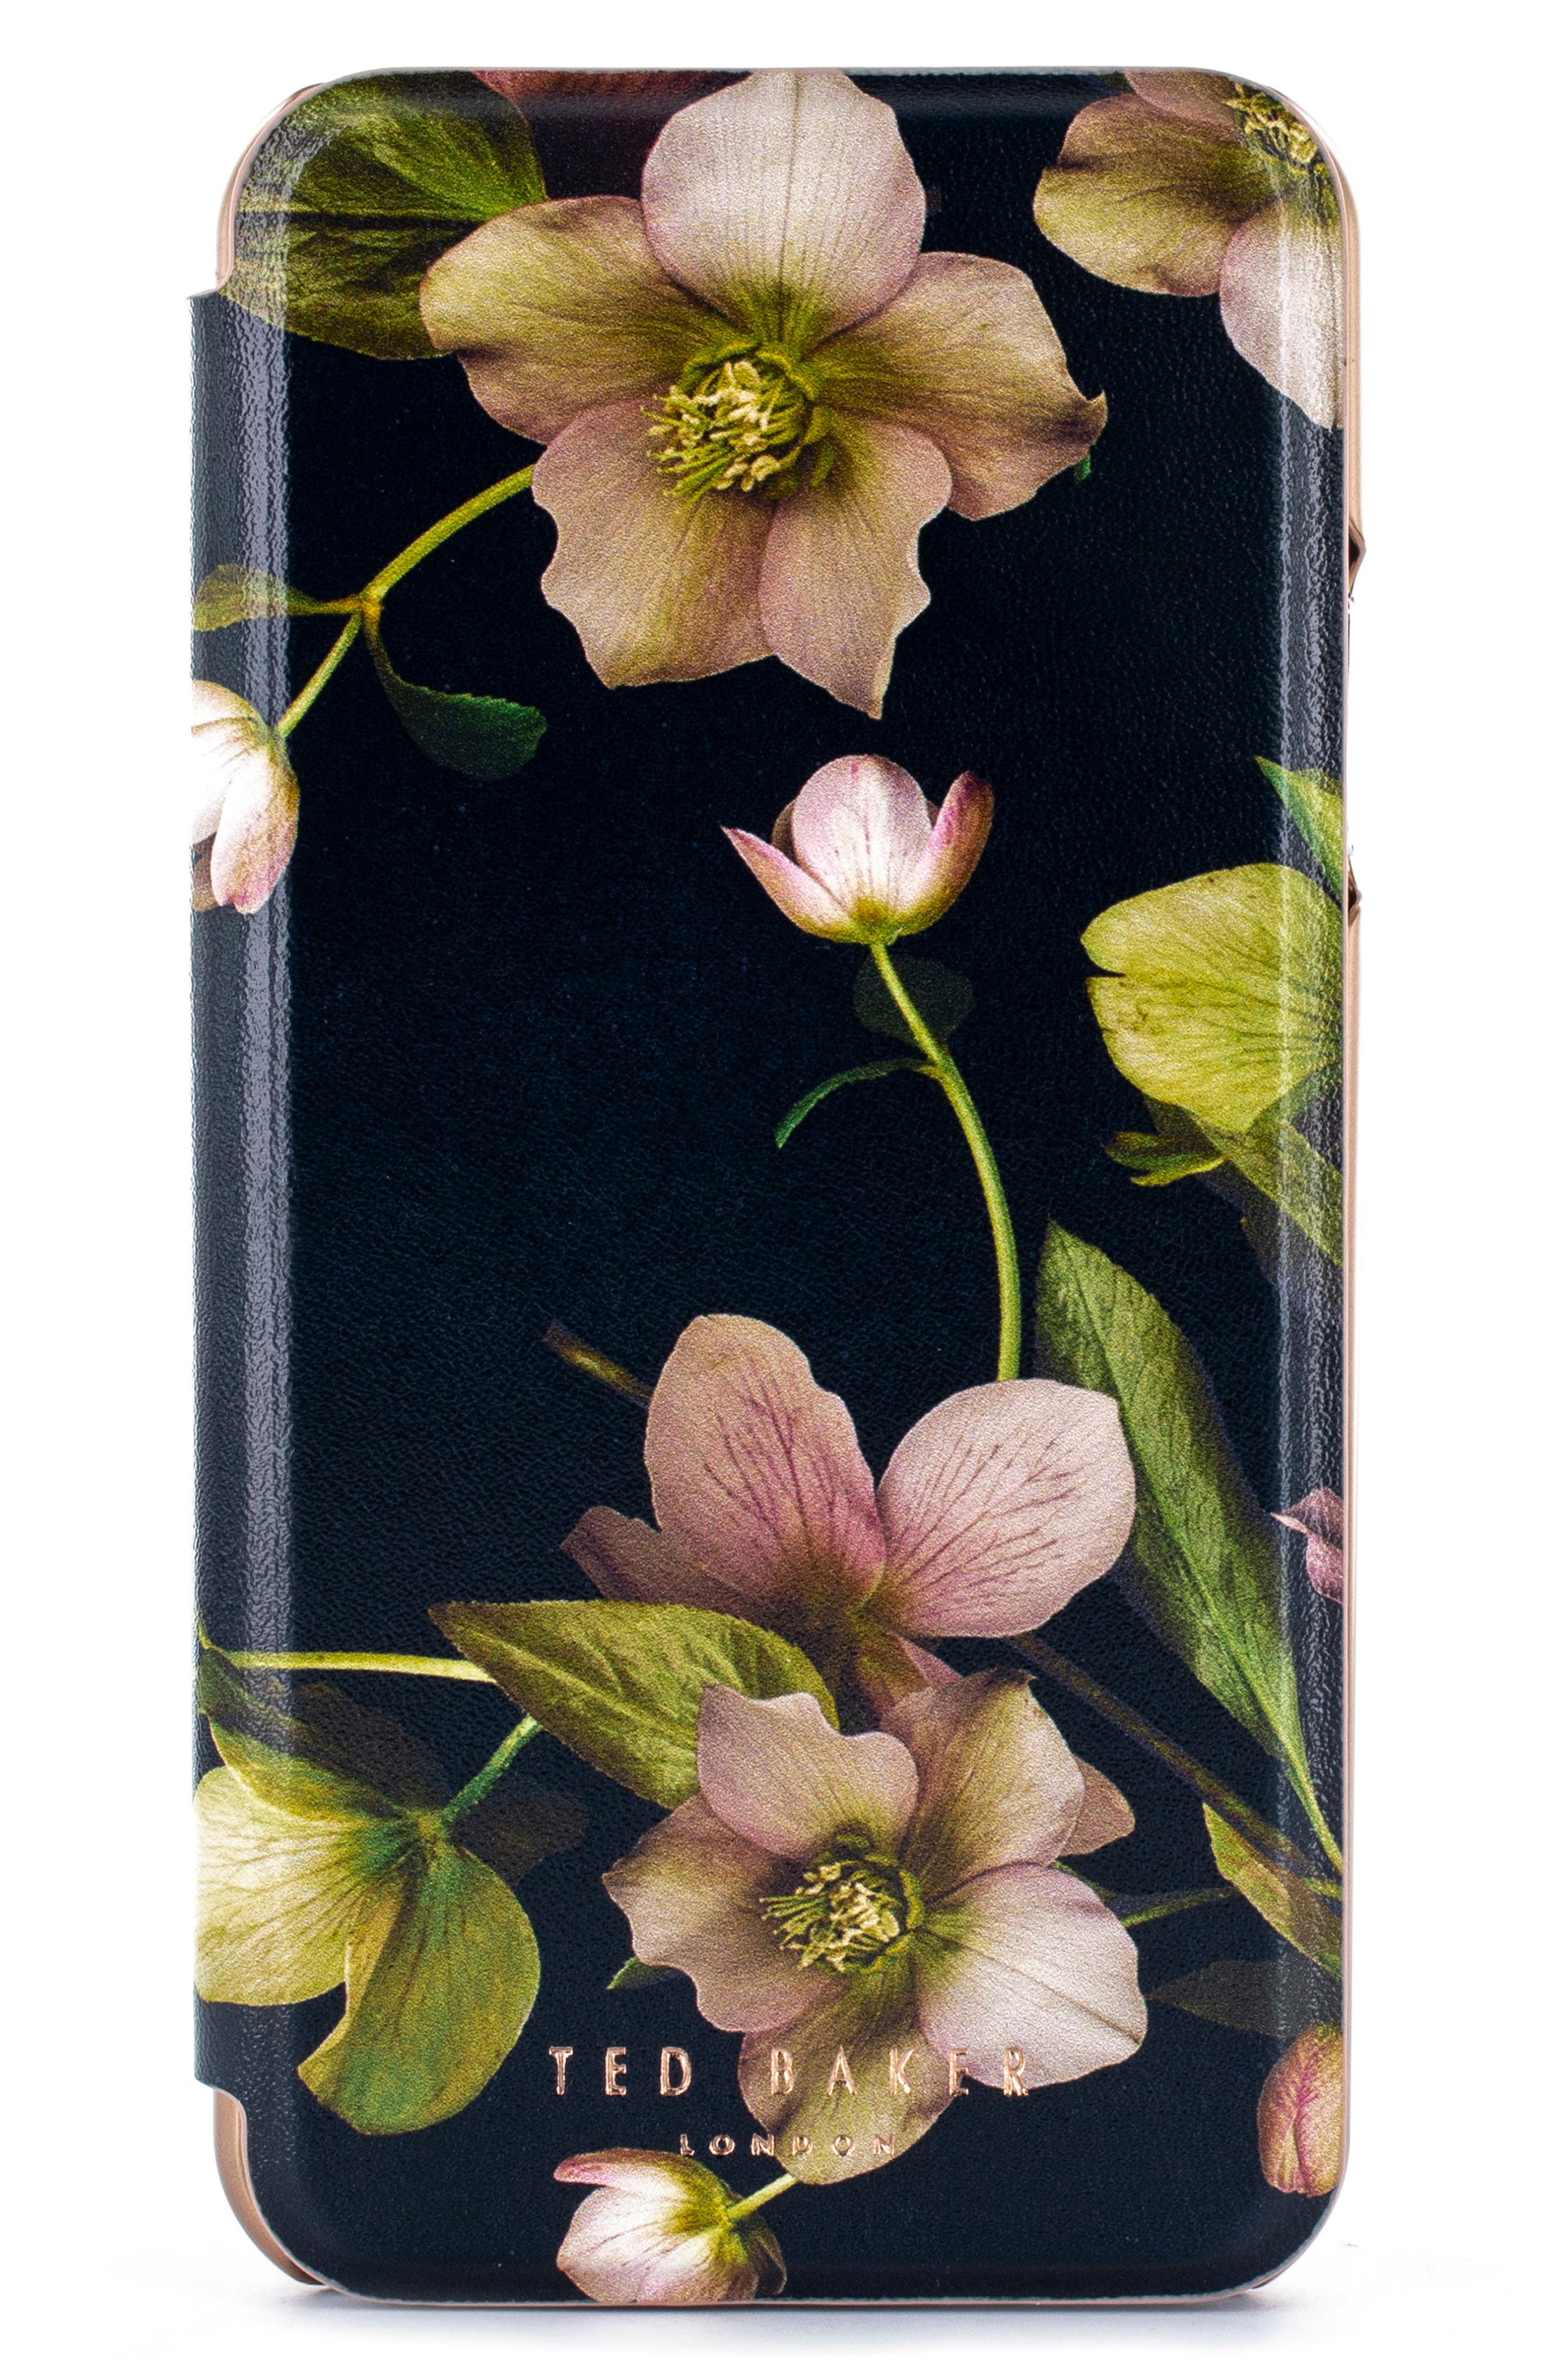 TED BAKER LONDON Arboretum iPhone X/Xs/Xs Max & XR Mirror Folio Case, Main, color, BLACK